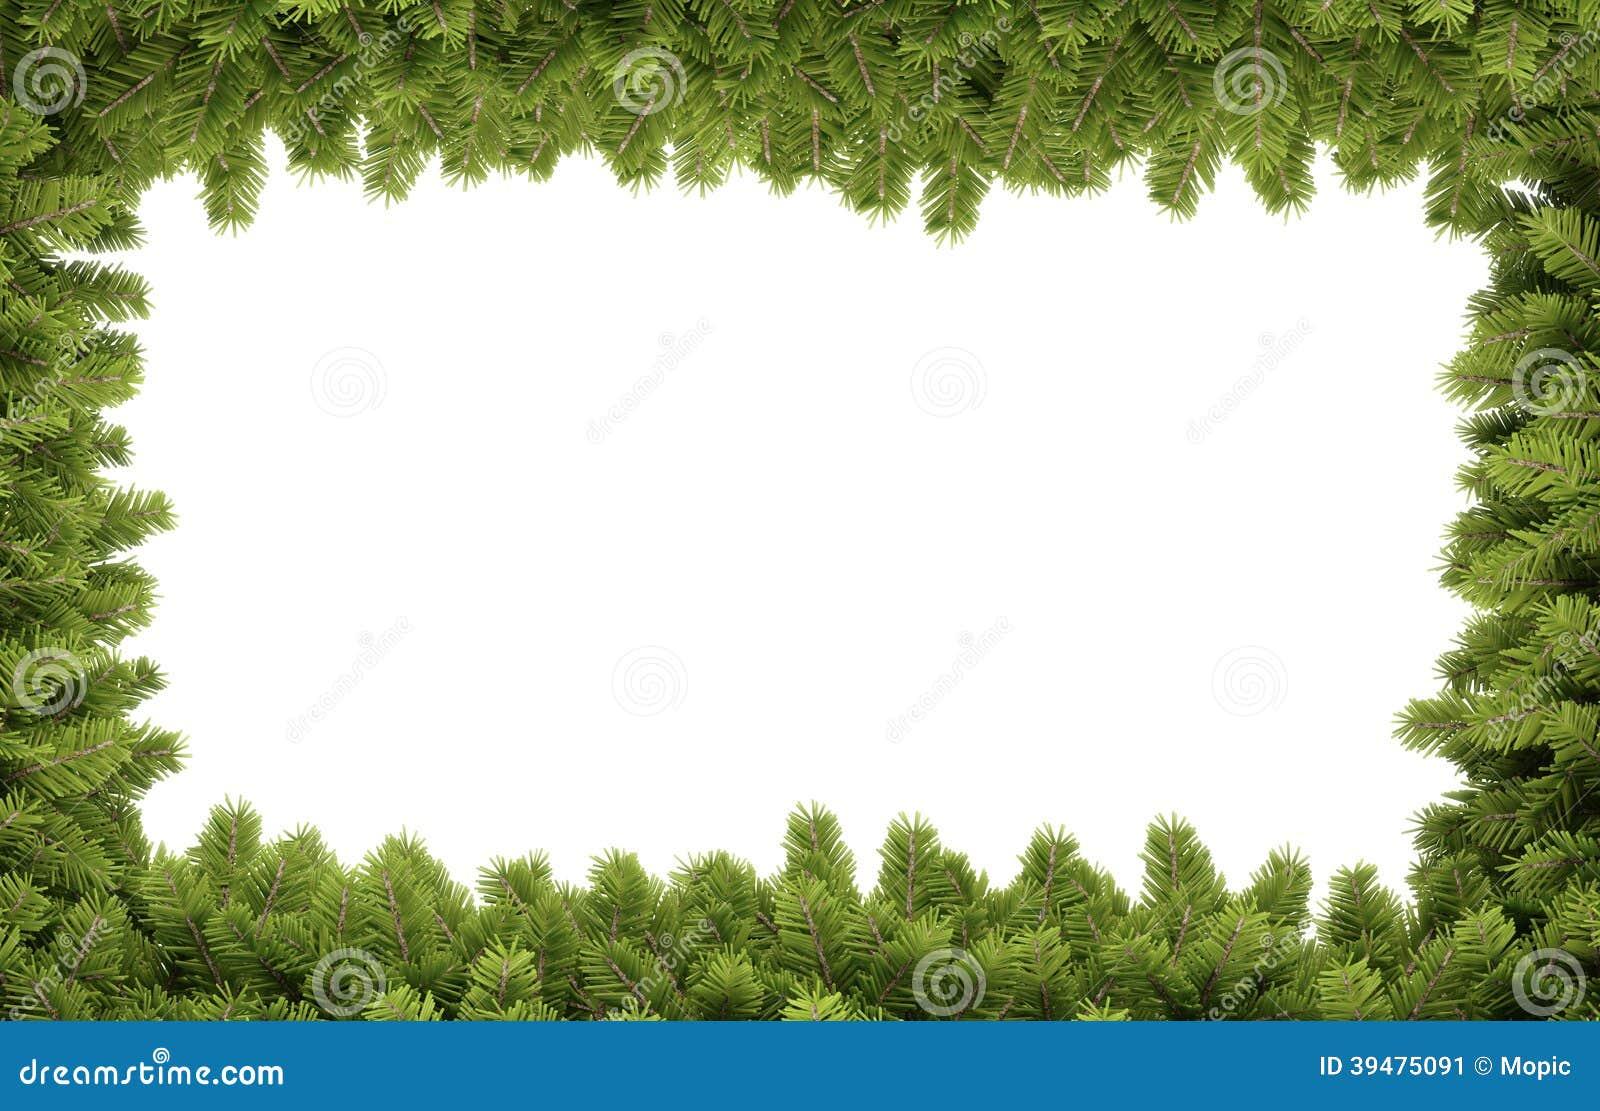 Christmas border stock illustration image of natural